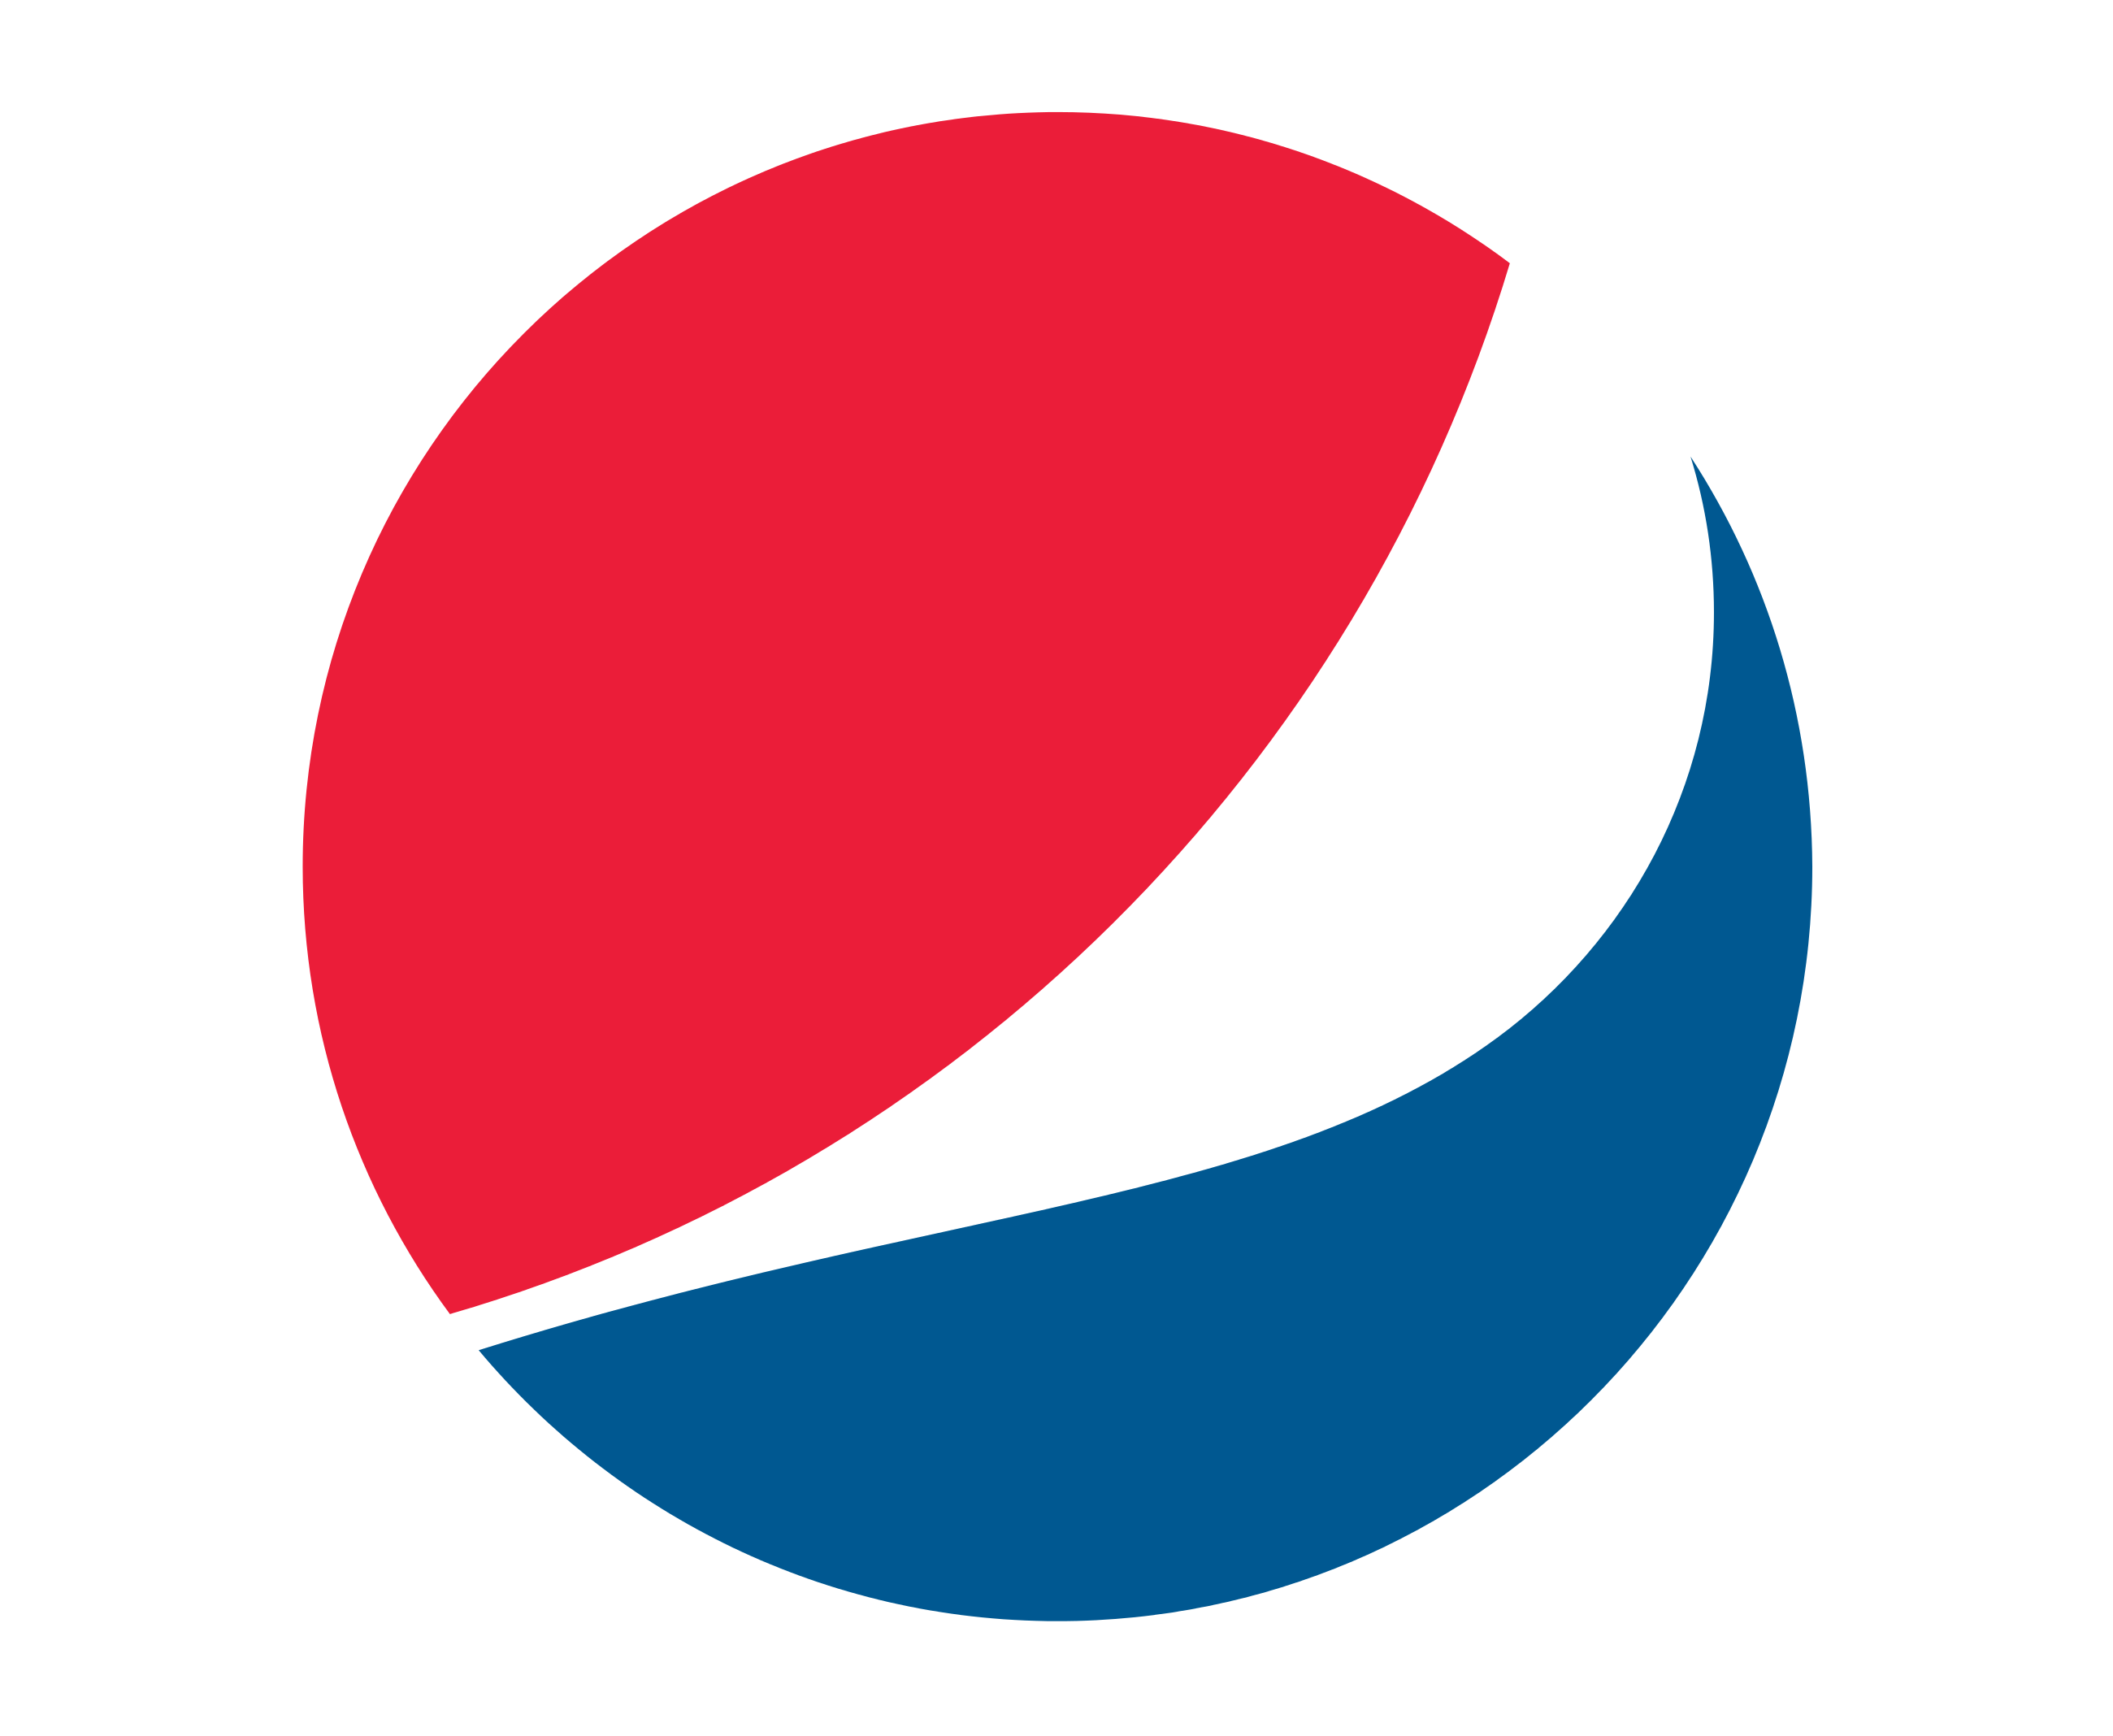 symbol logos Pepsi Logo, Pepsi Symbol, Meaning, History